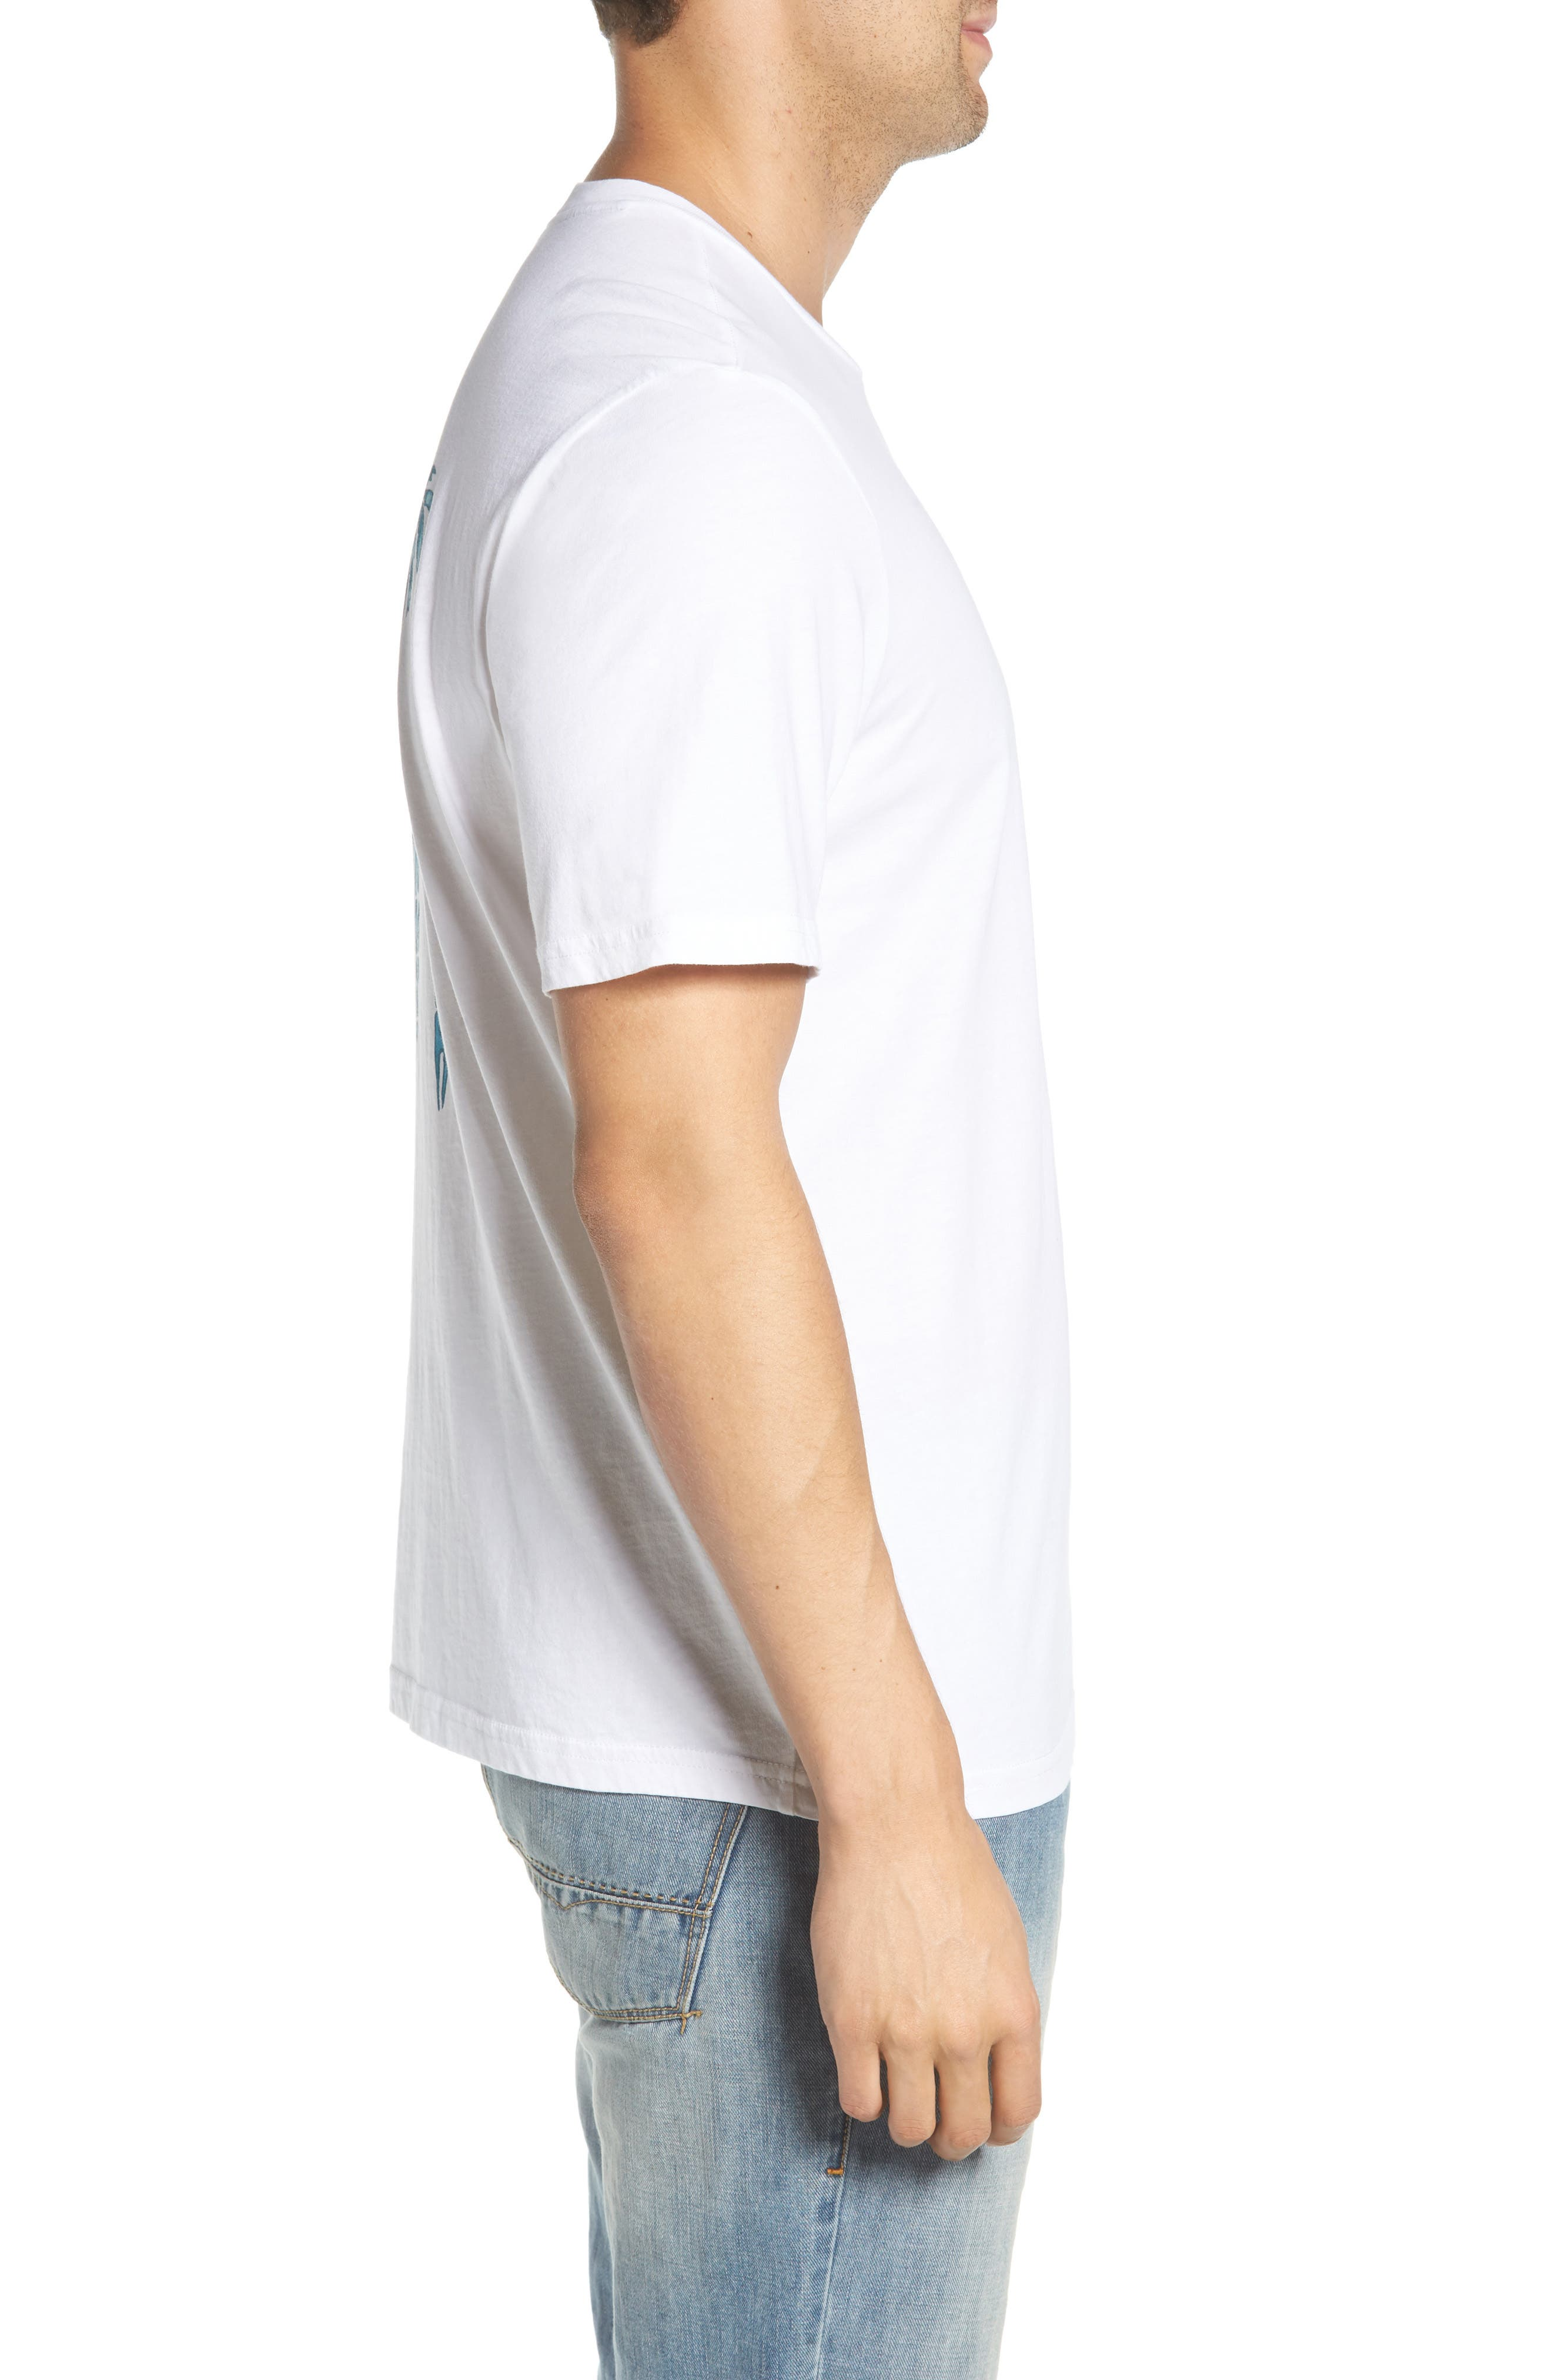 Parrot Pair T-Shirt,                             Alternate thumbnail 3, color,                             White